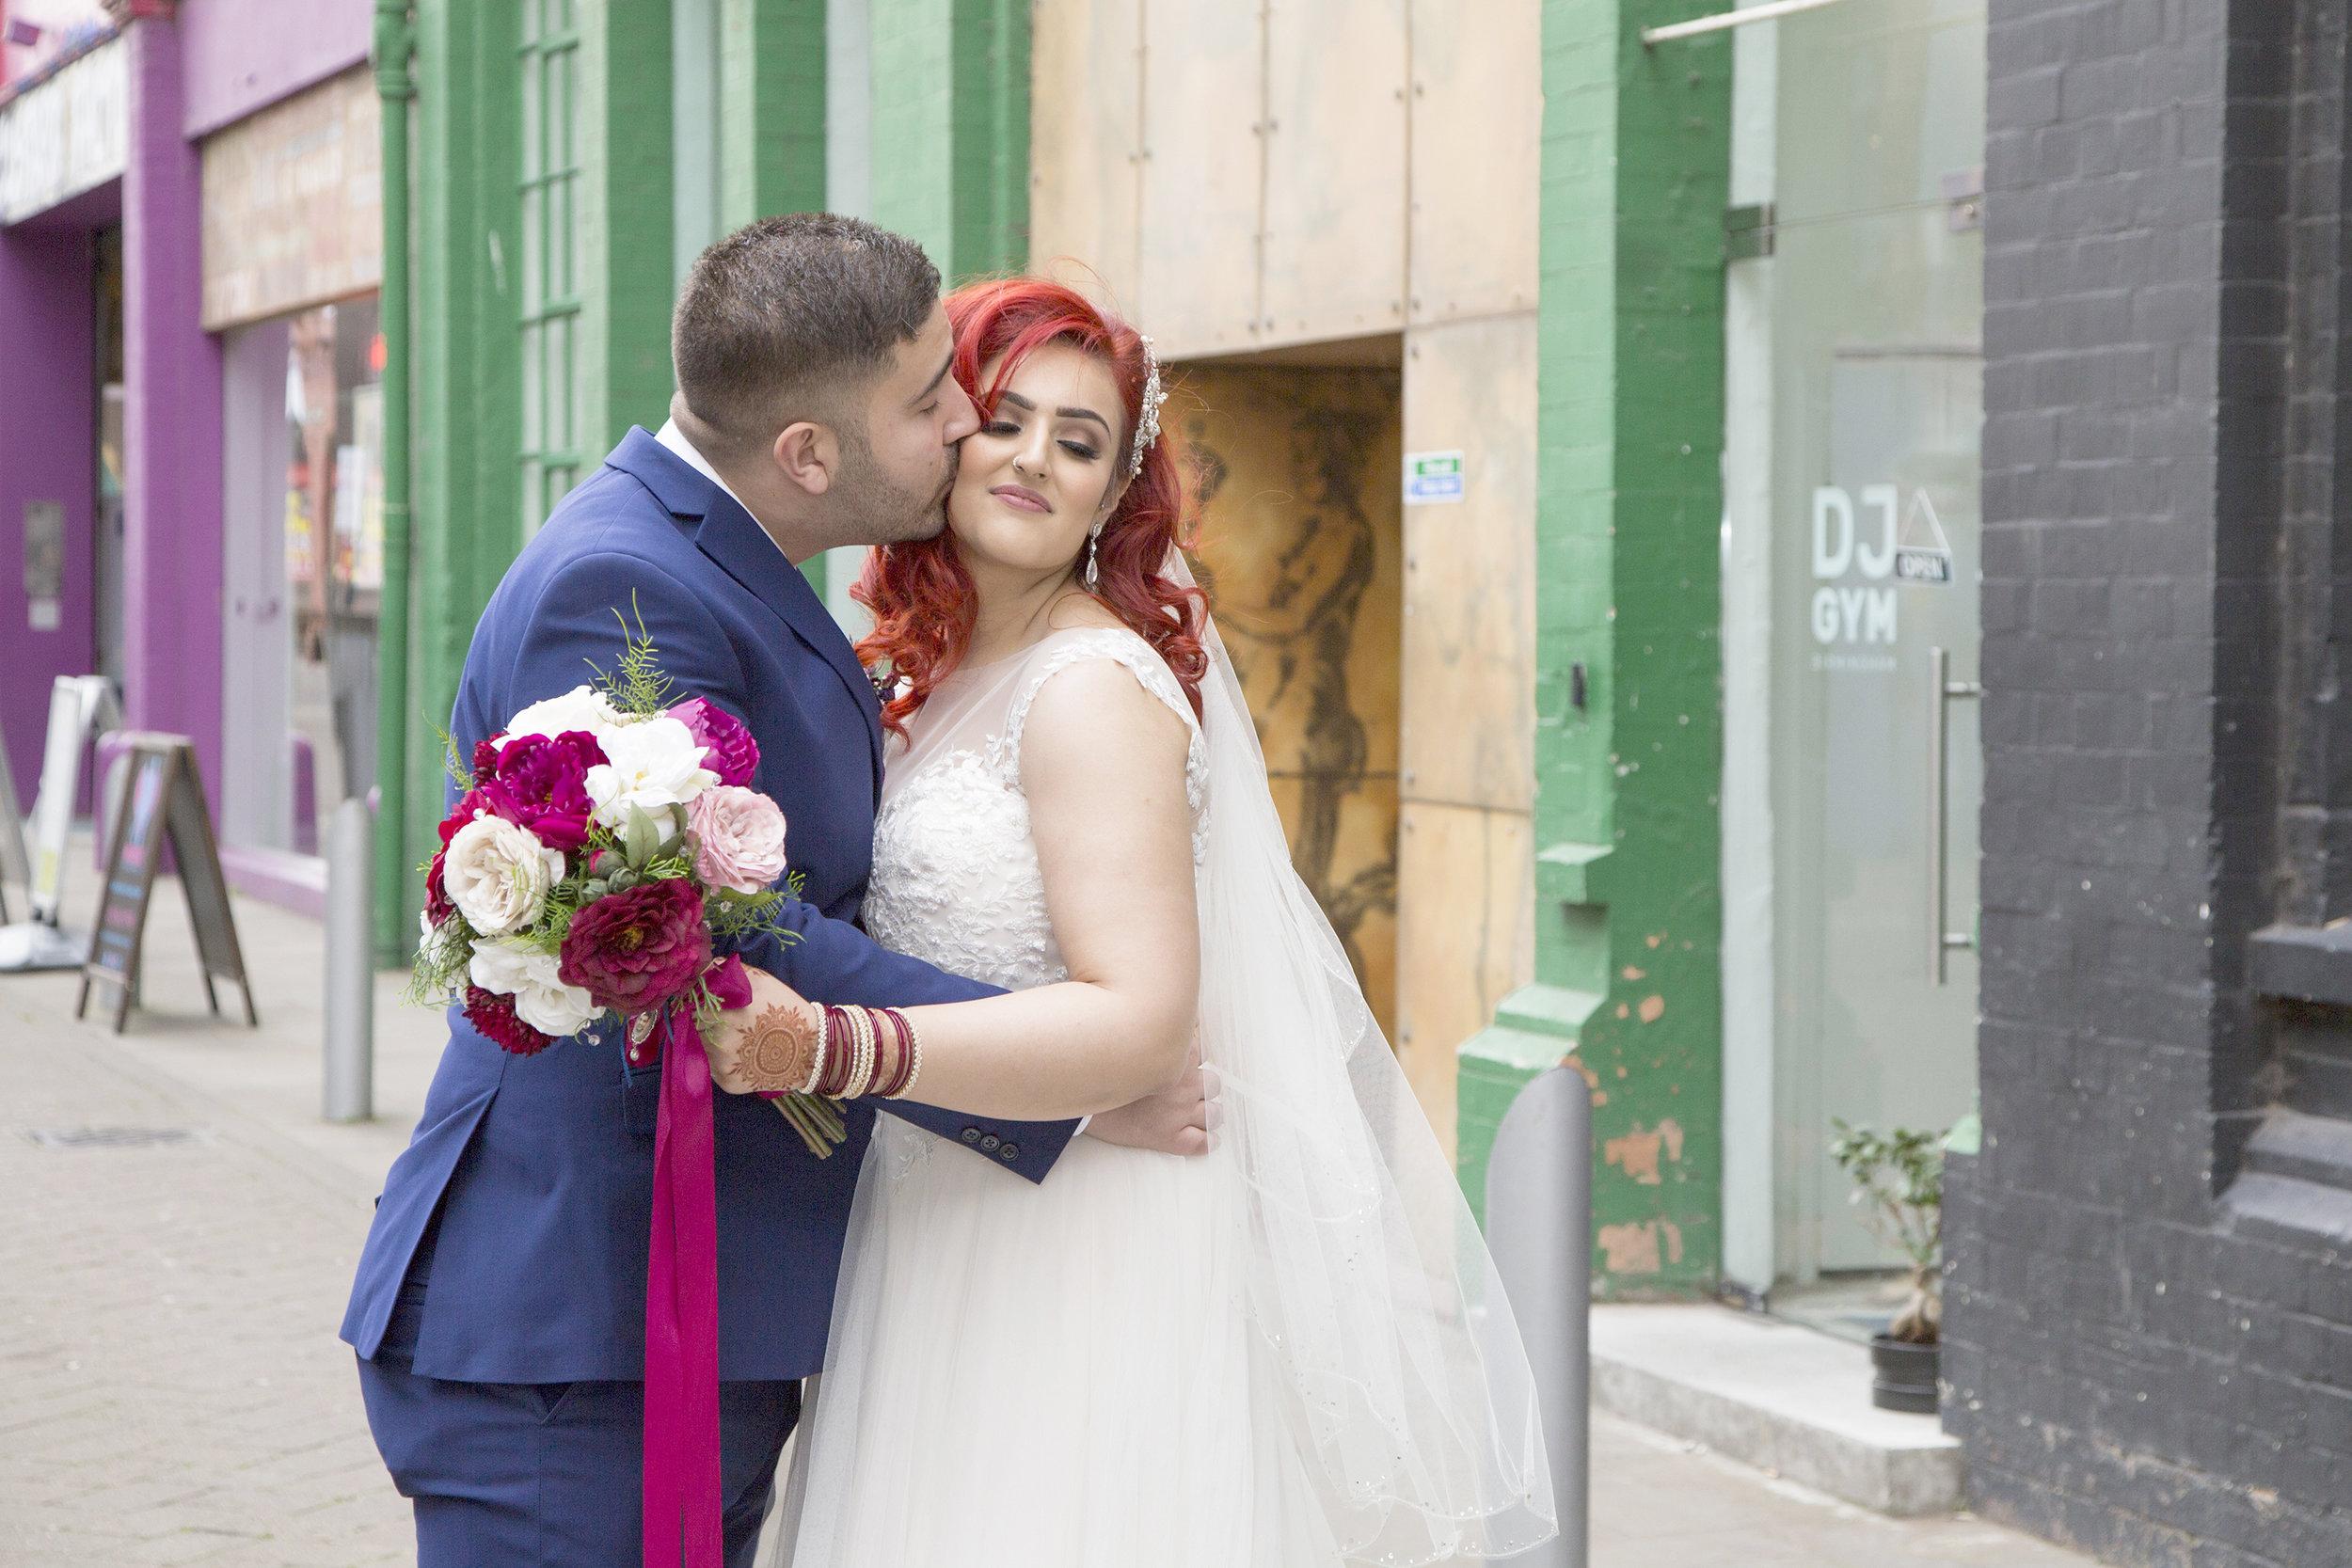 Custard Factory - The Bond Cafe Wedding